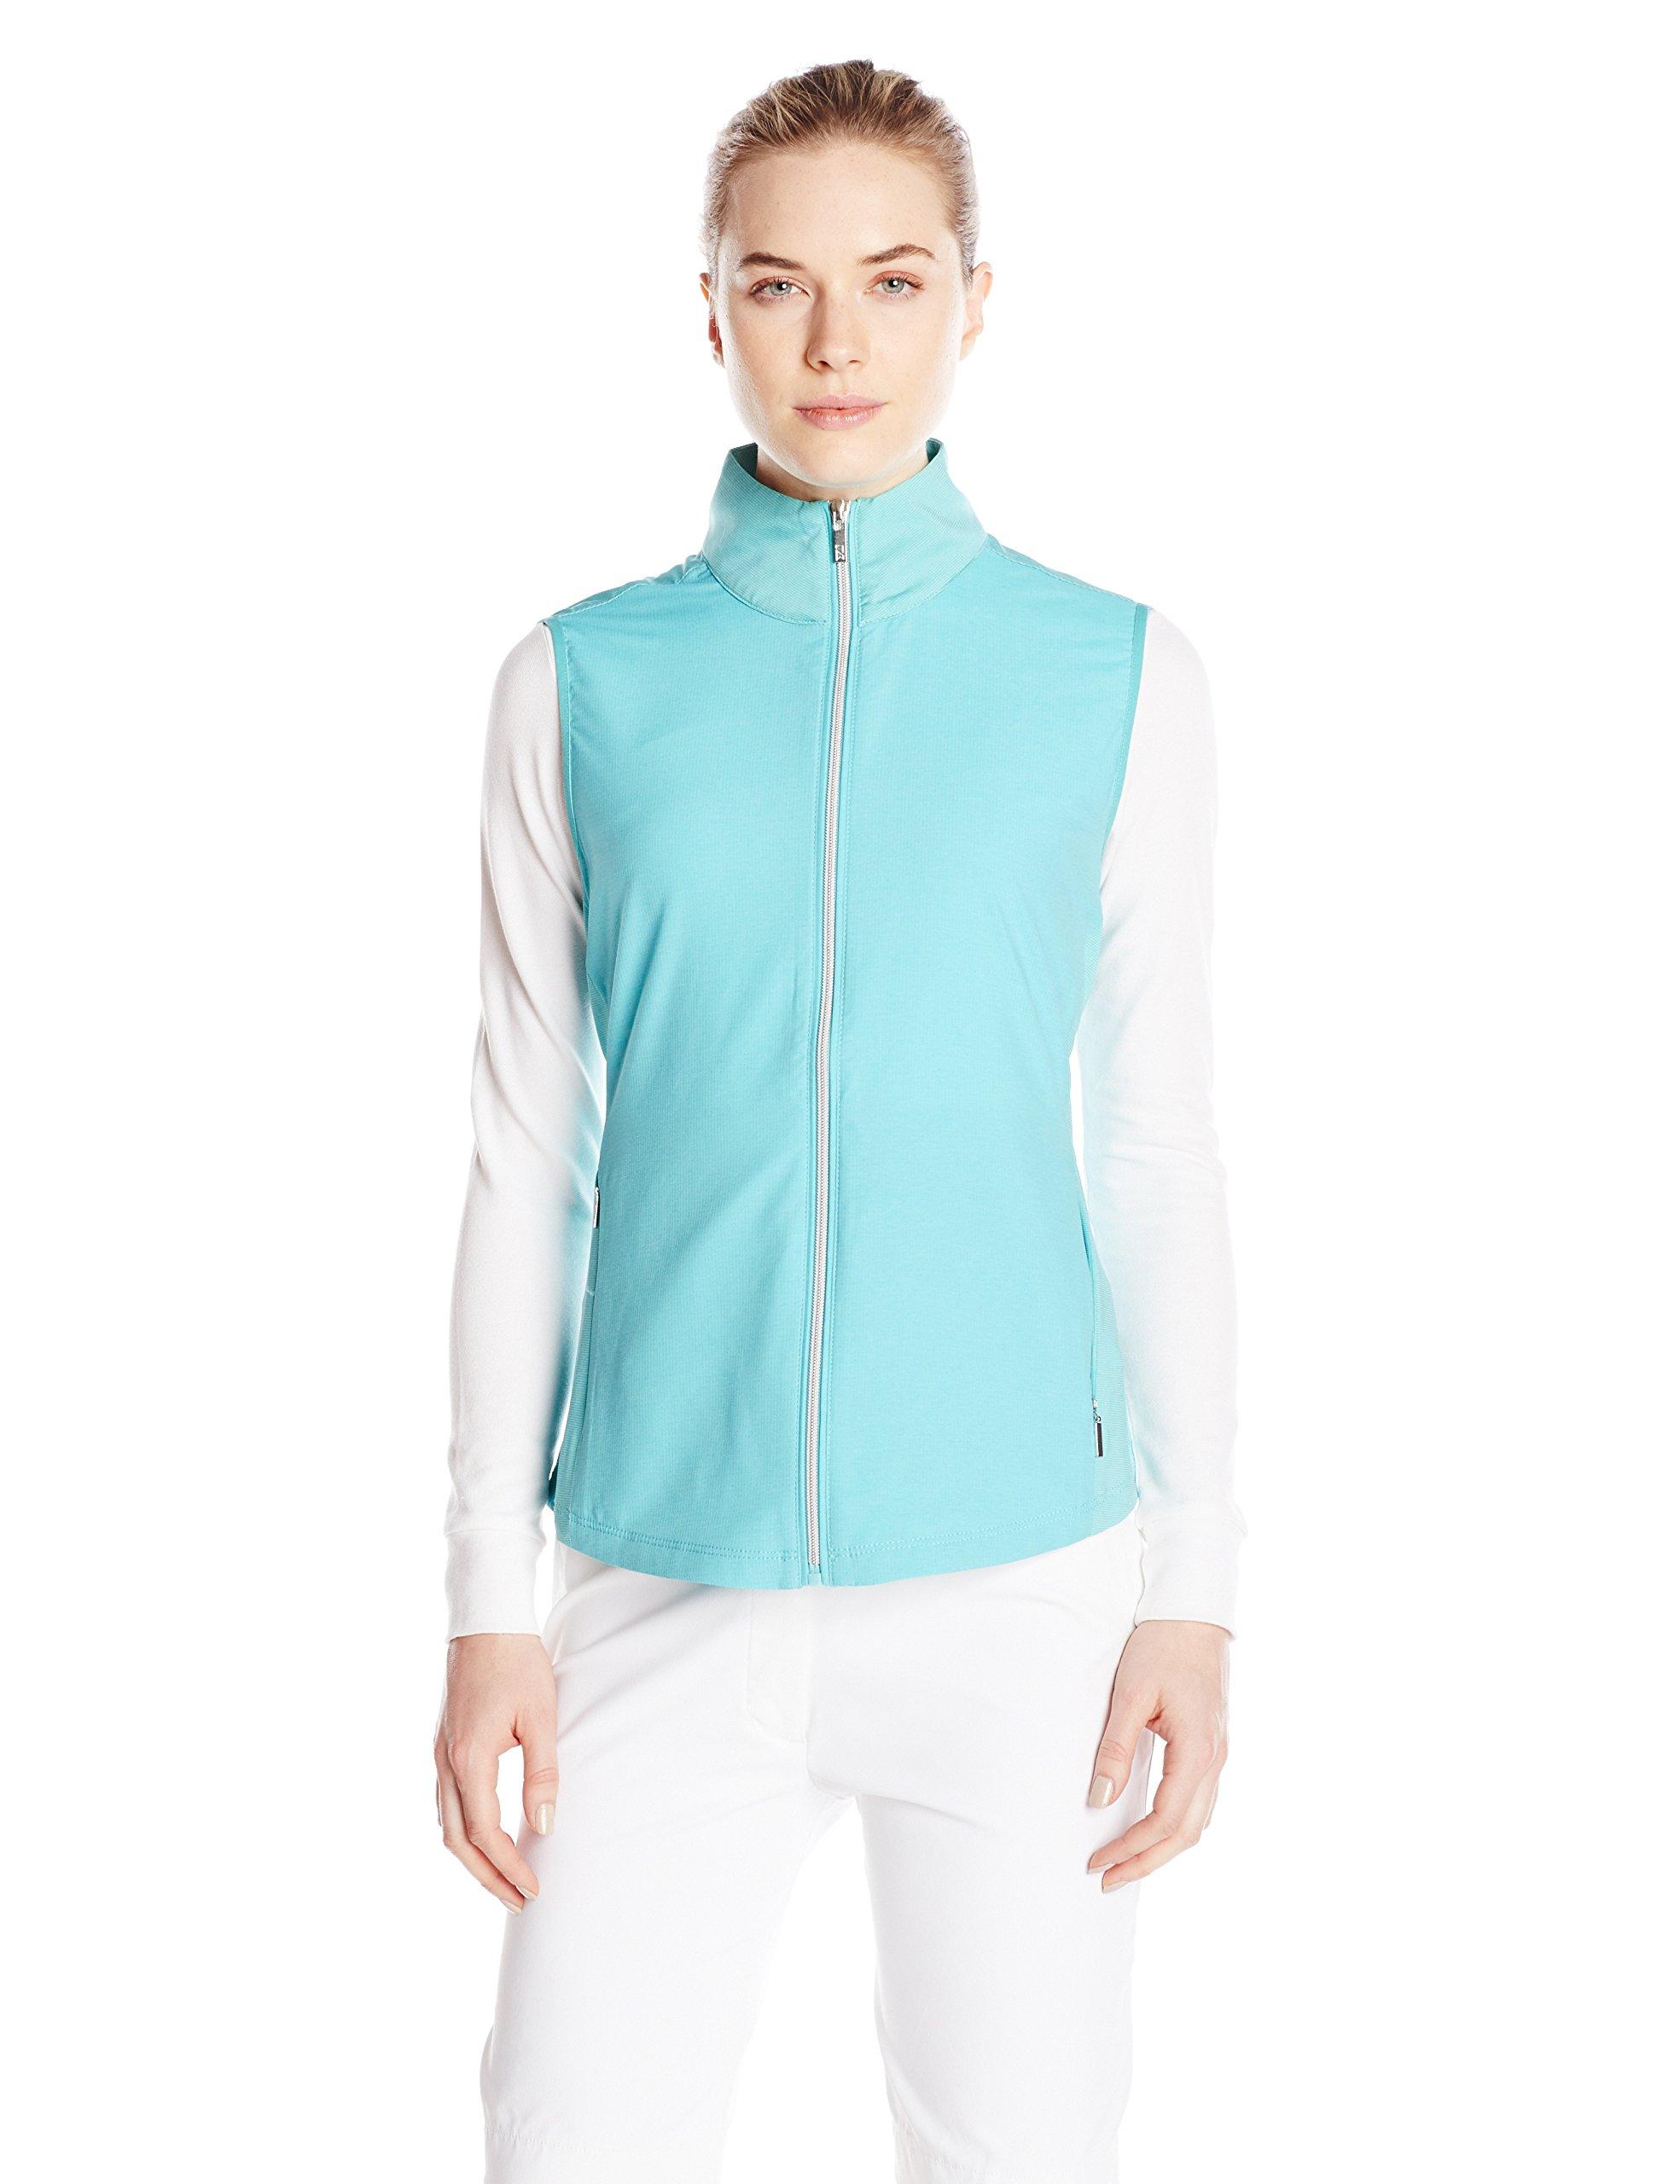 Cutter & Buck Women's CB Weathertec Laura Hybrid Vest, Quench, X-Small by Cutter